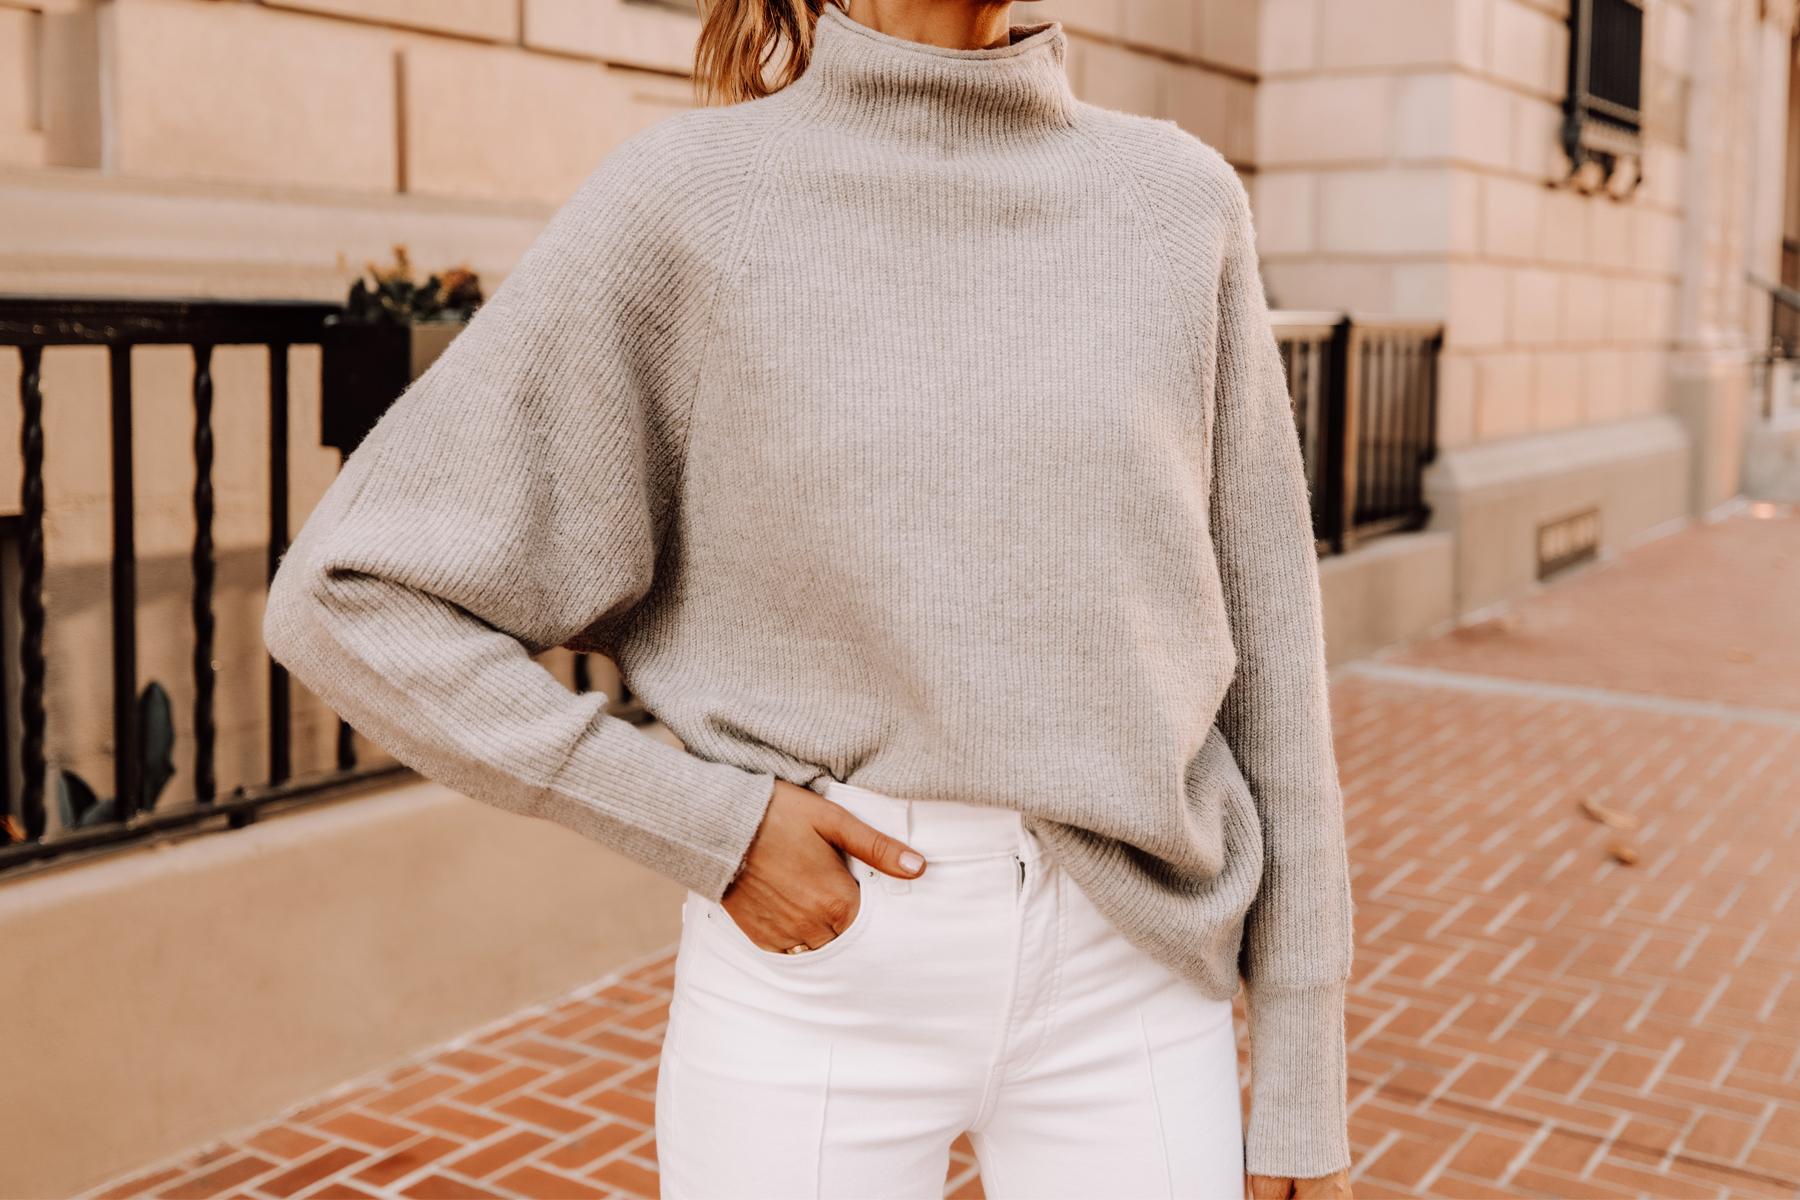 Fashion Jackson Wearing Express Beige Mockneck Sweater White Jeans